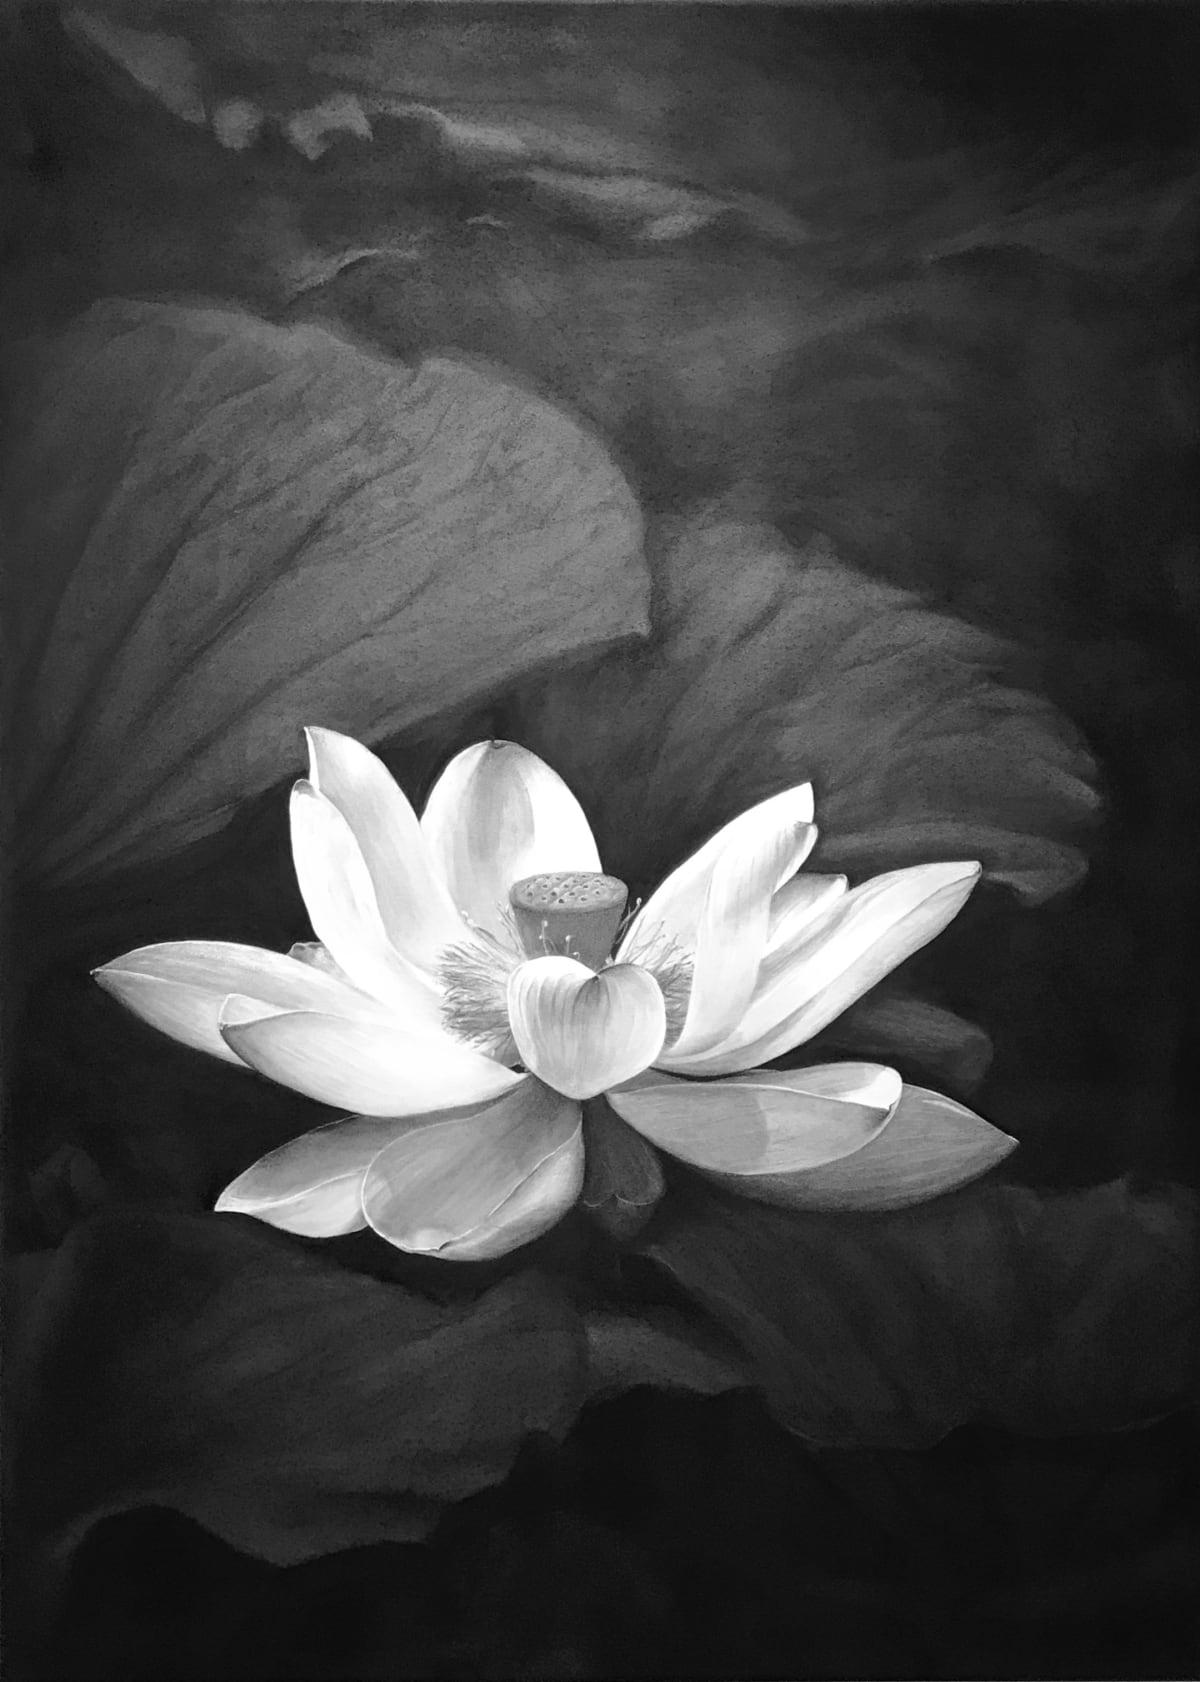 Liu Ling, Serenity, 2019